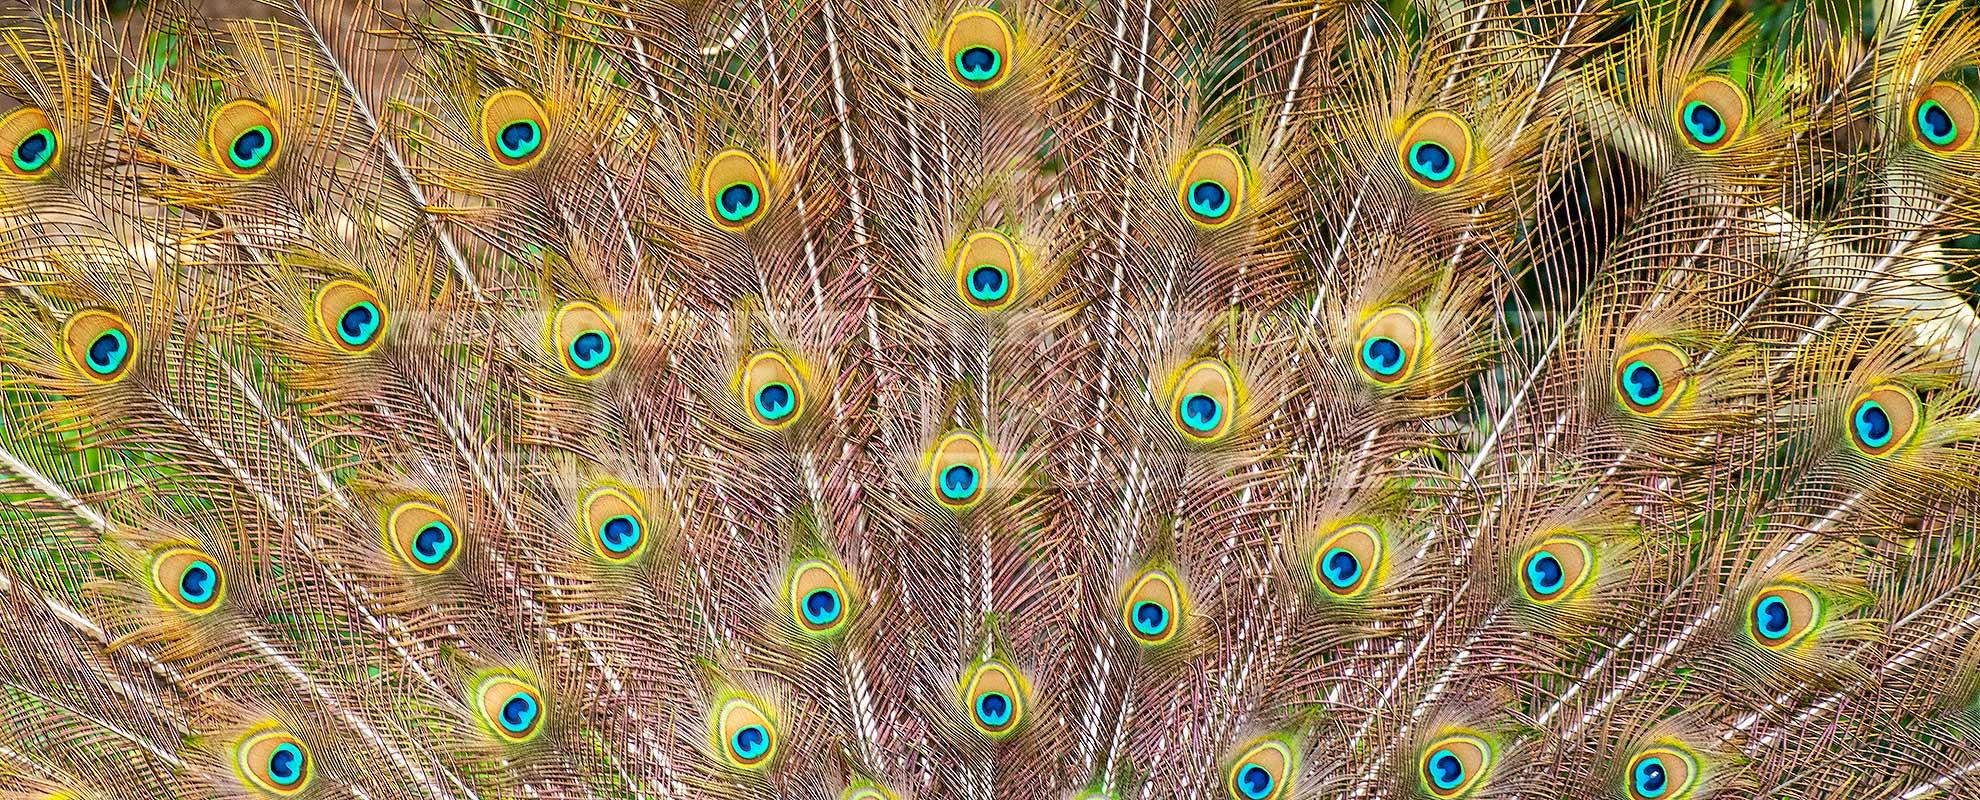 peacock tail at los angeles arboretum